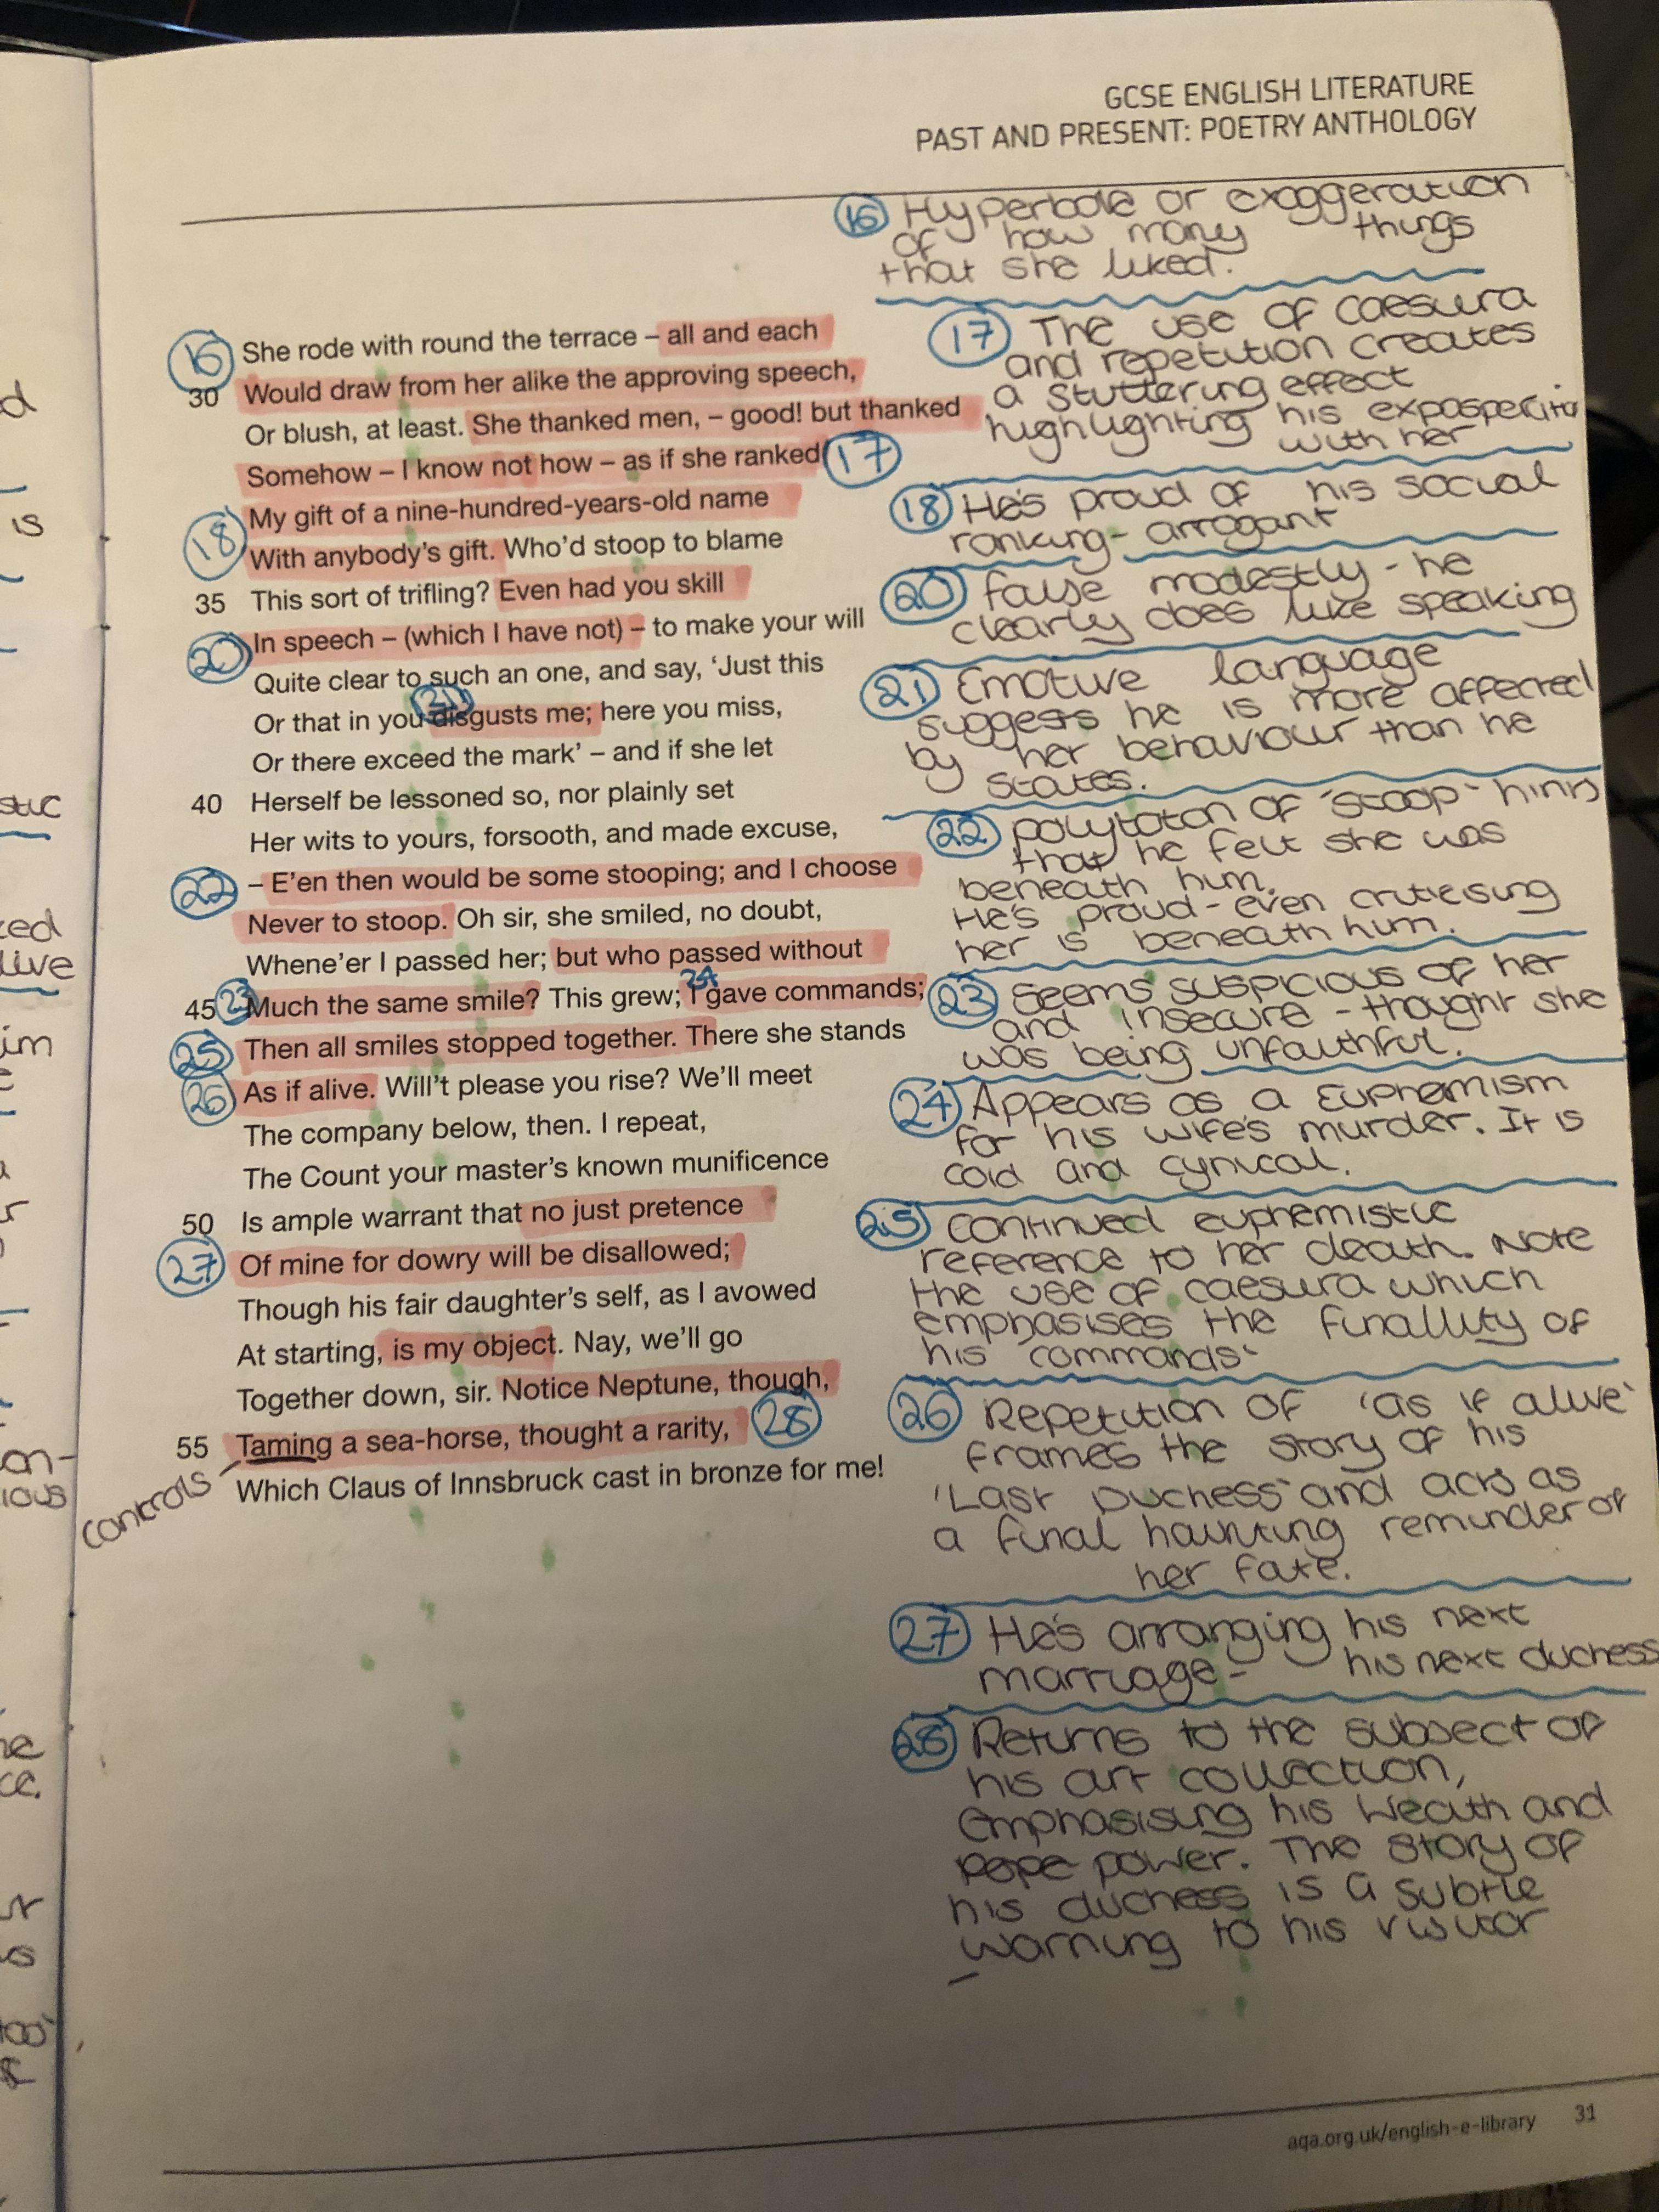 My Last Duches Analysi Poem Gcse English Literature Line By Analysis